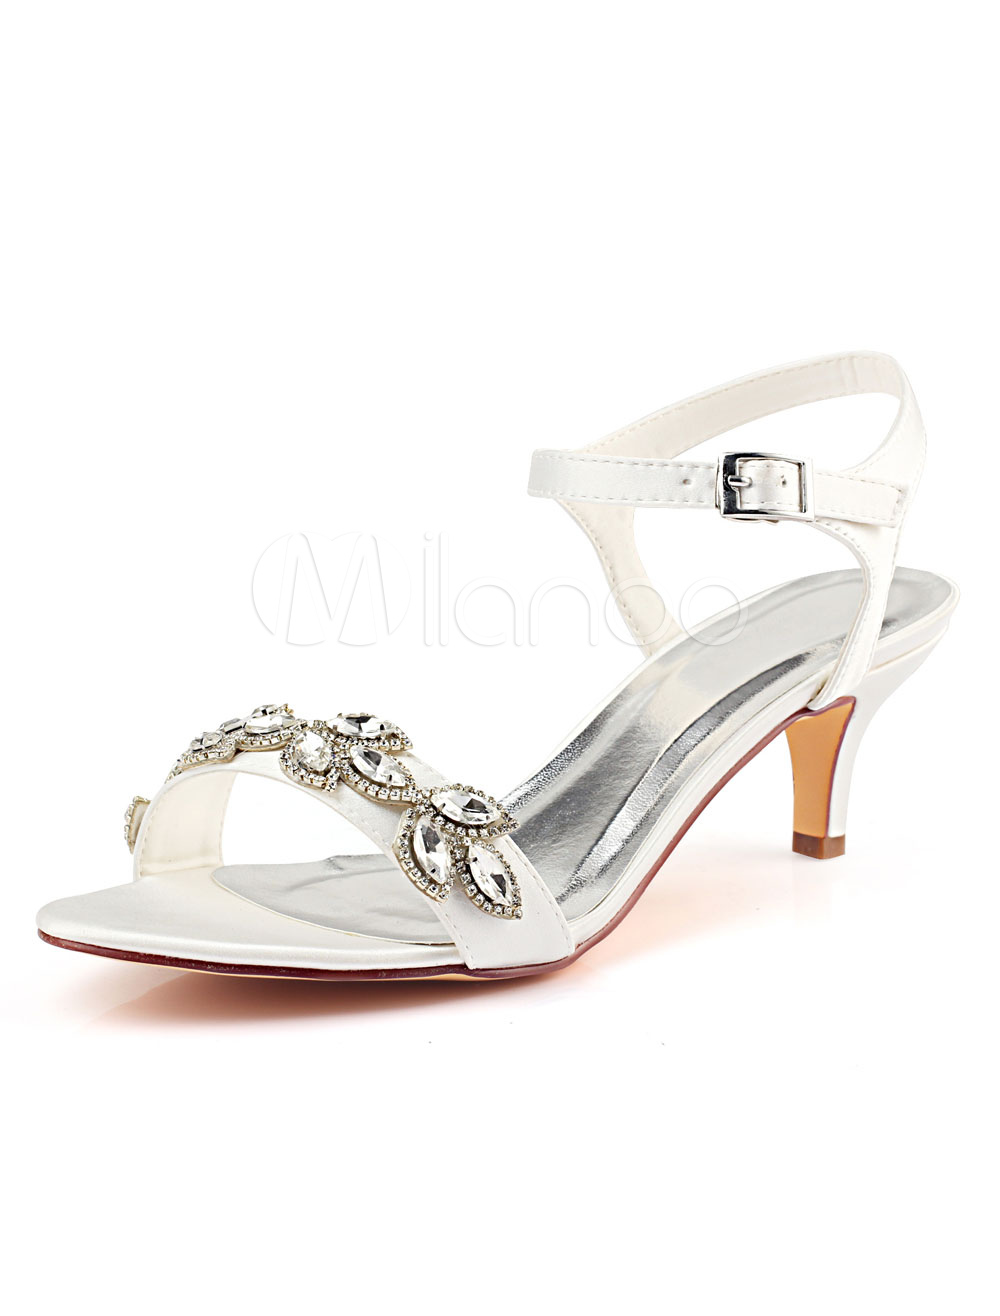 b012e8edf71 Satin Wedding Shoes Ivory Open Toe Rhinestones Kitten Heel Bridal Shoes  Mother Shoes